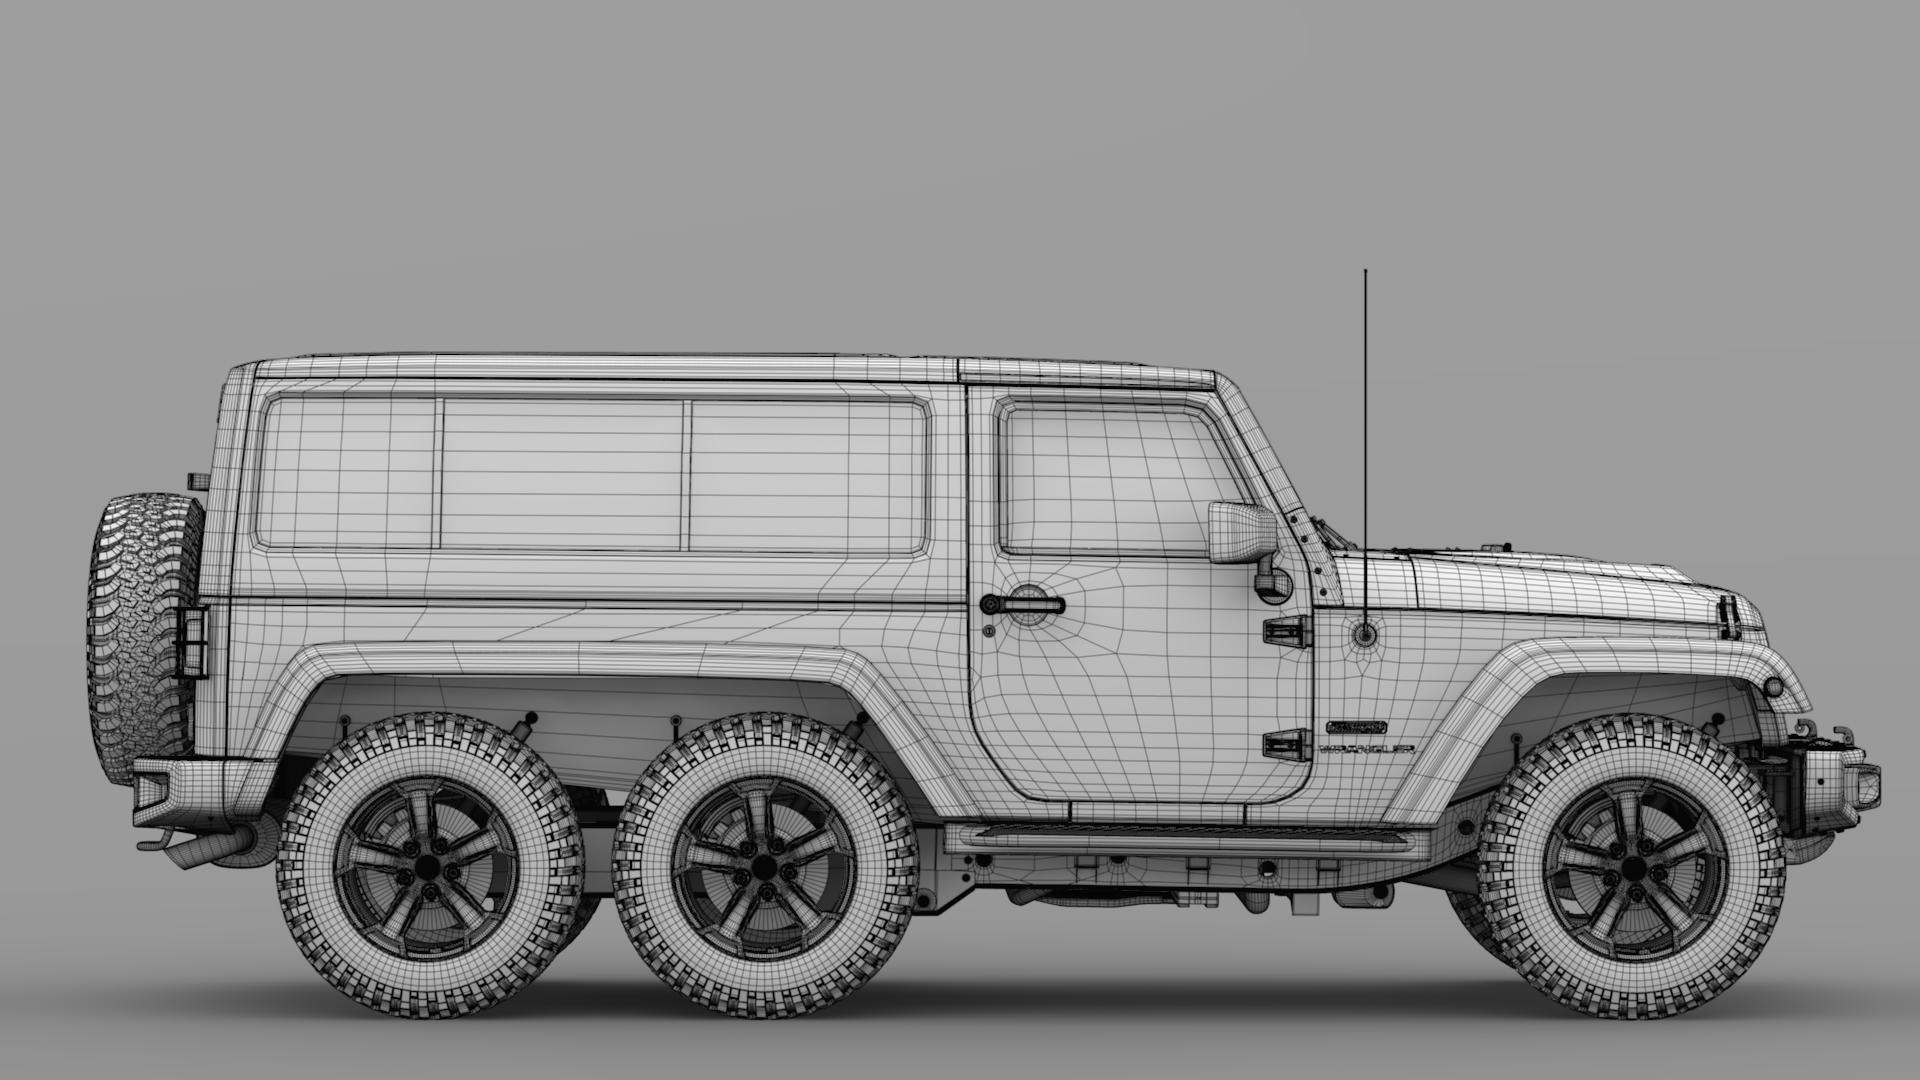 jeep wrangler 6×6 rubicon recon jk 2017 3d model max fbx c4d lwo ma mb hrc xsi obj 276853